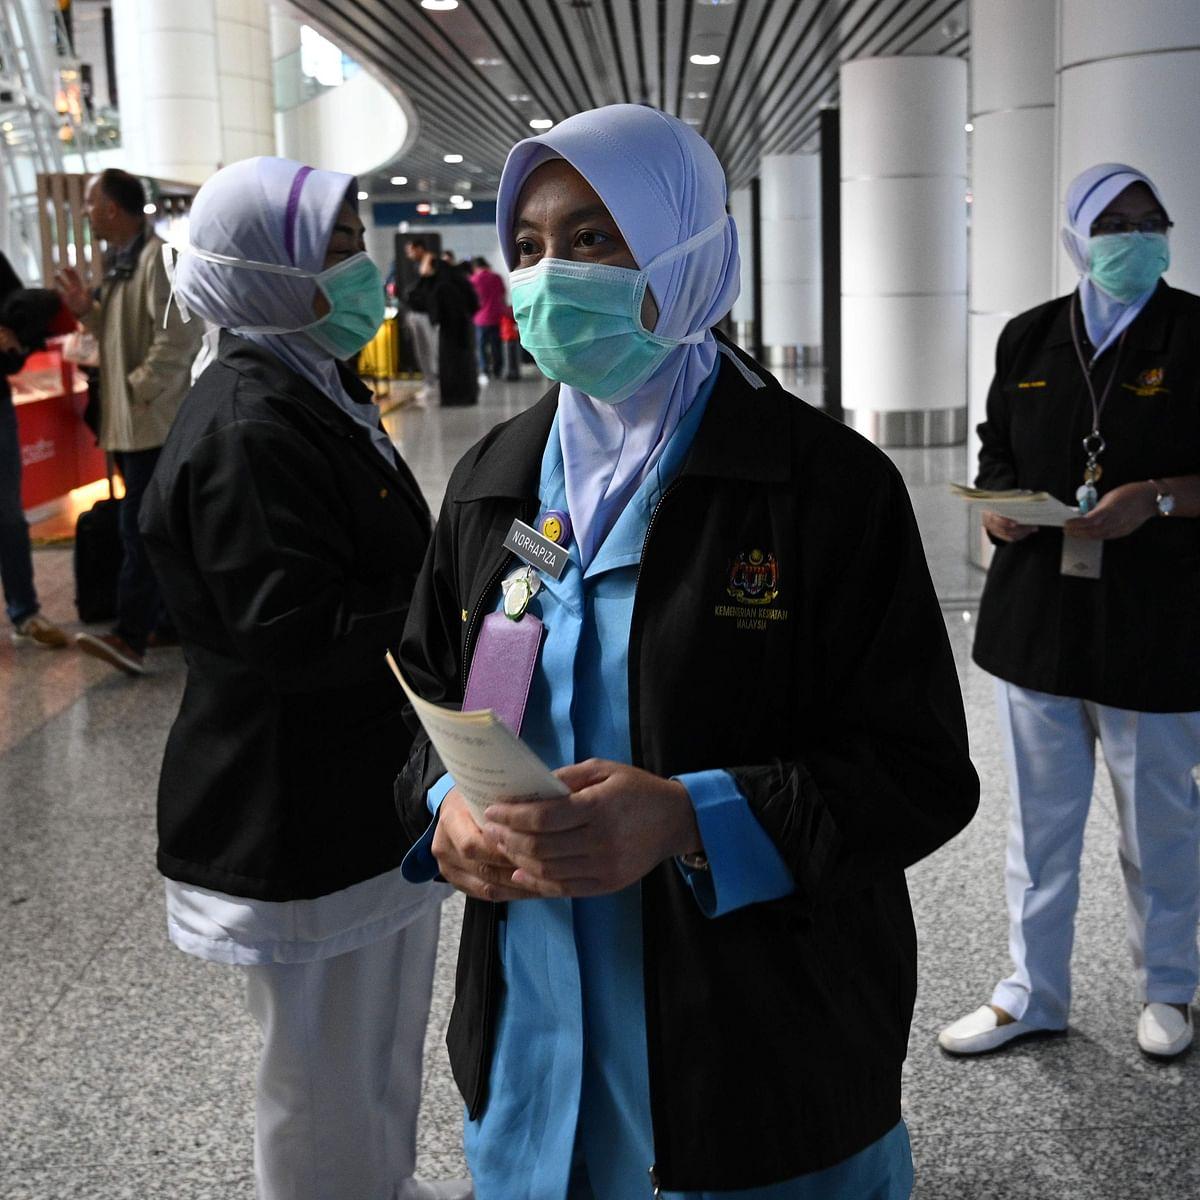 Latest Coronavirus Update in India: After three more positive cases, Modi govt issues fresh travel advisory